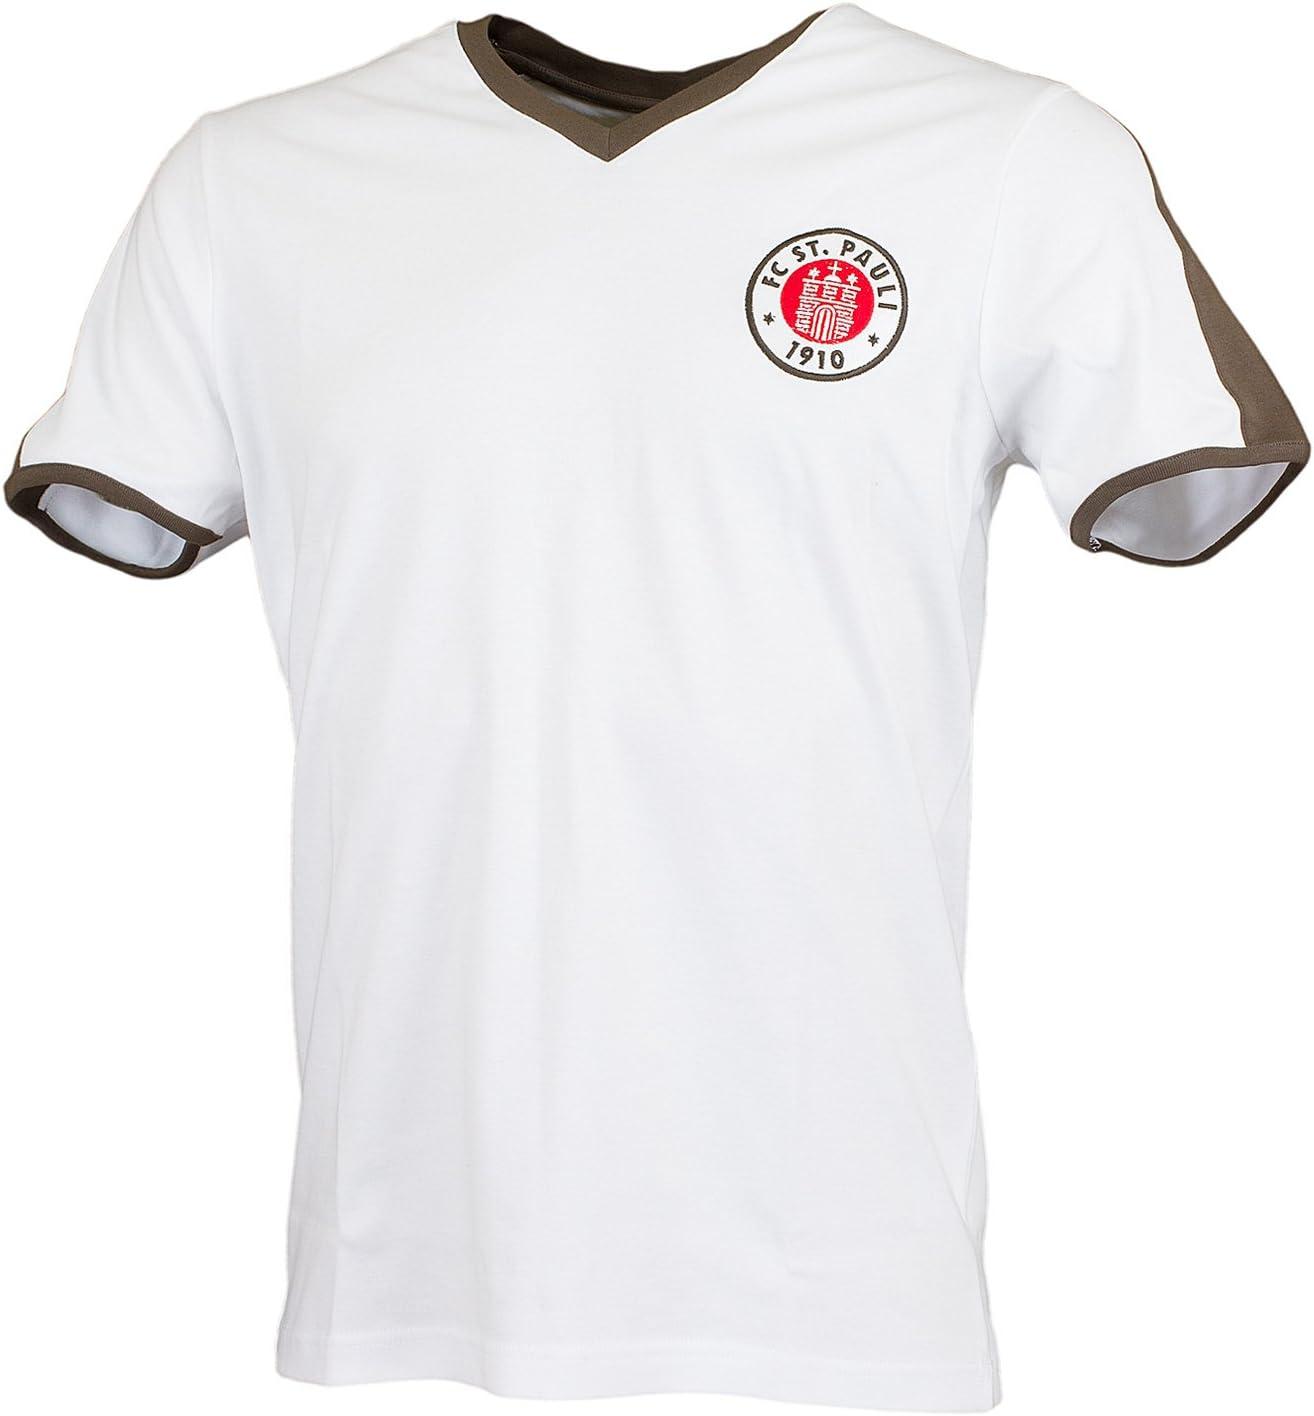 FC St. Pauli Retro Camiseta 1985, Blanco/marrón: Amazon.es ...